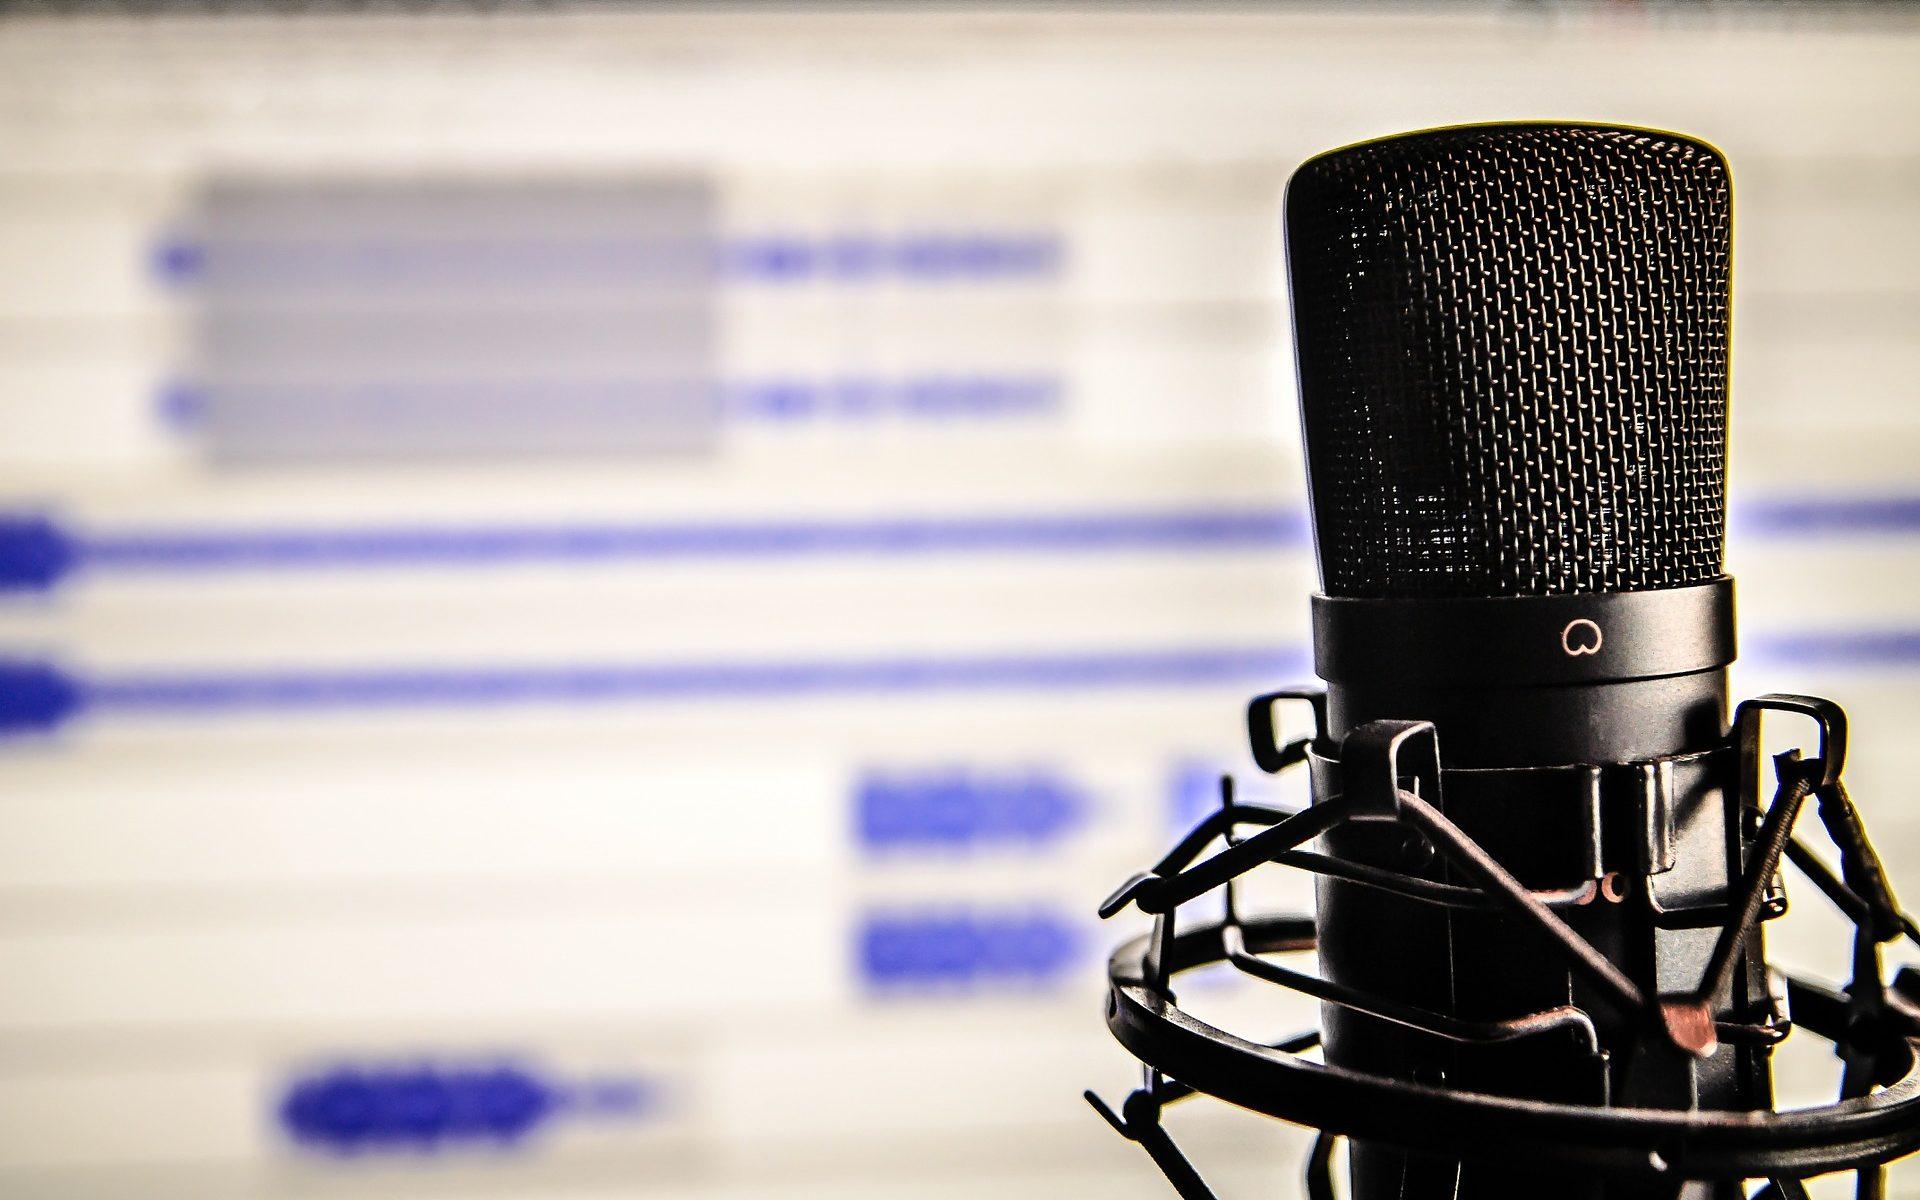 https://pixabay.com/de/photos/mikrophon-audio-computer-338481/